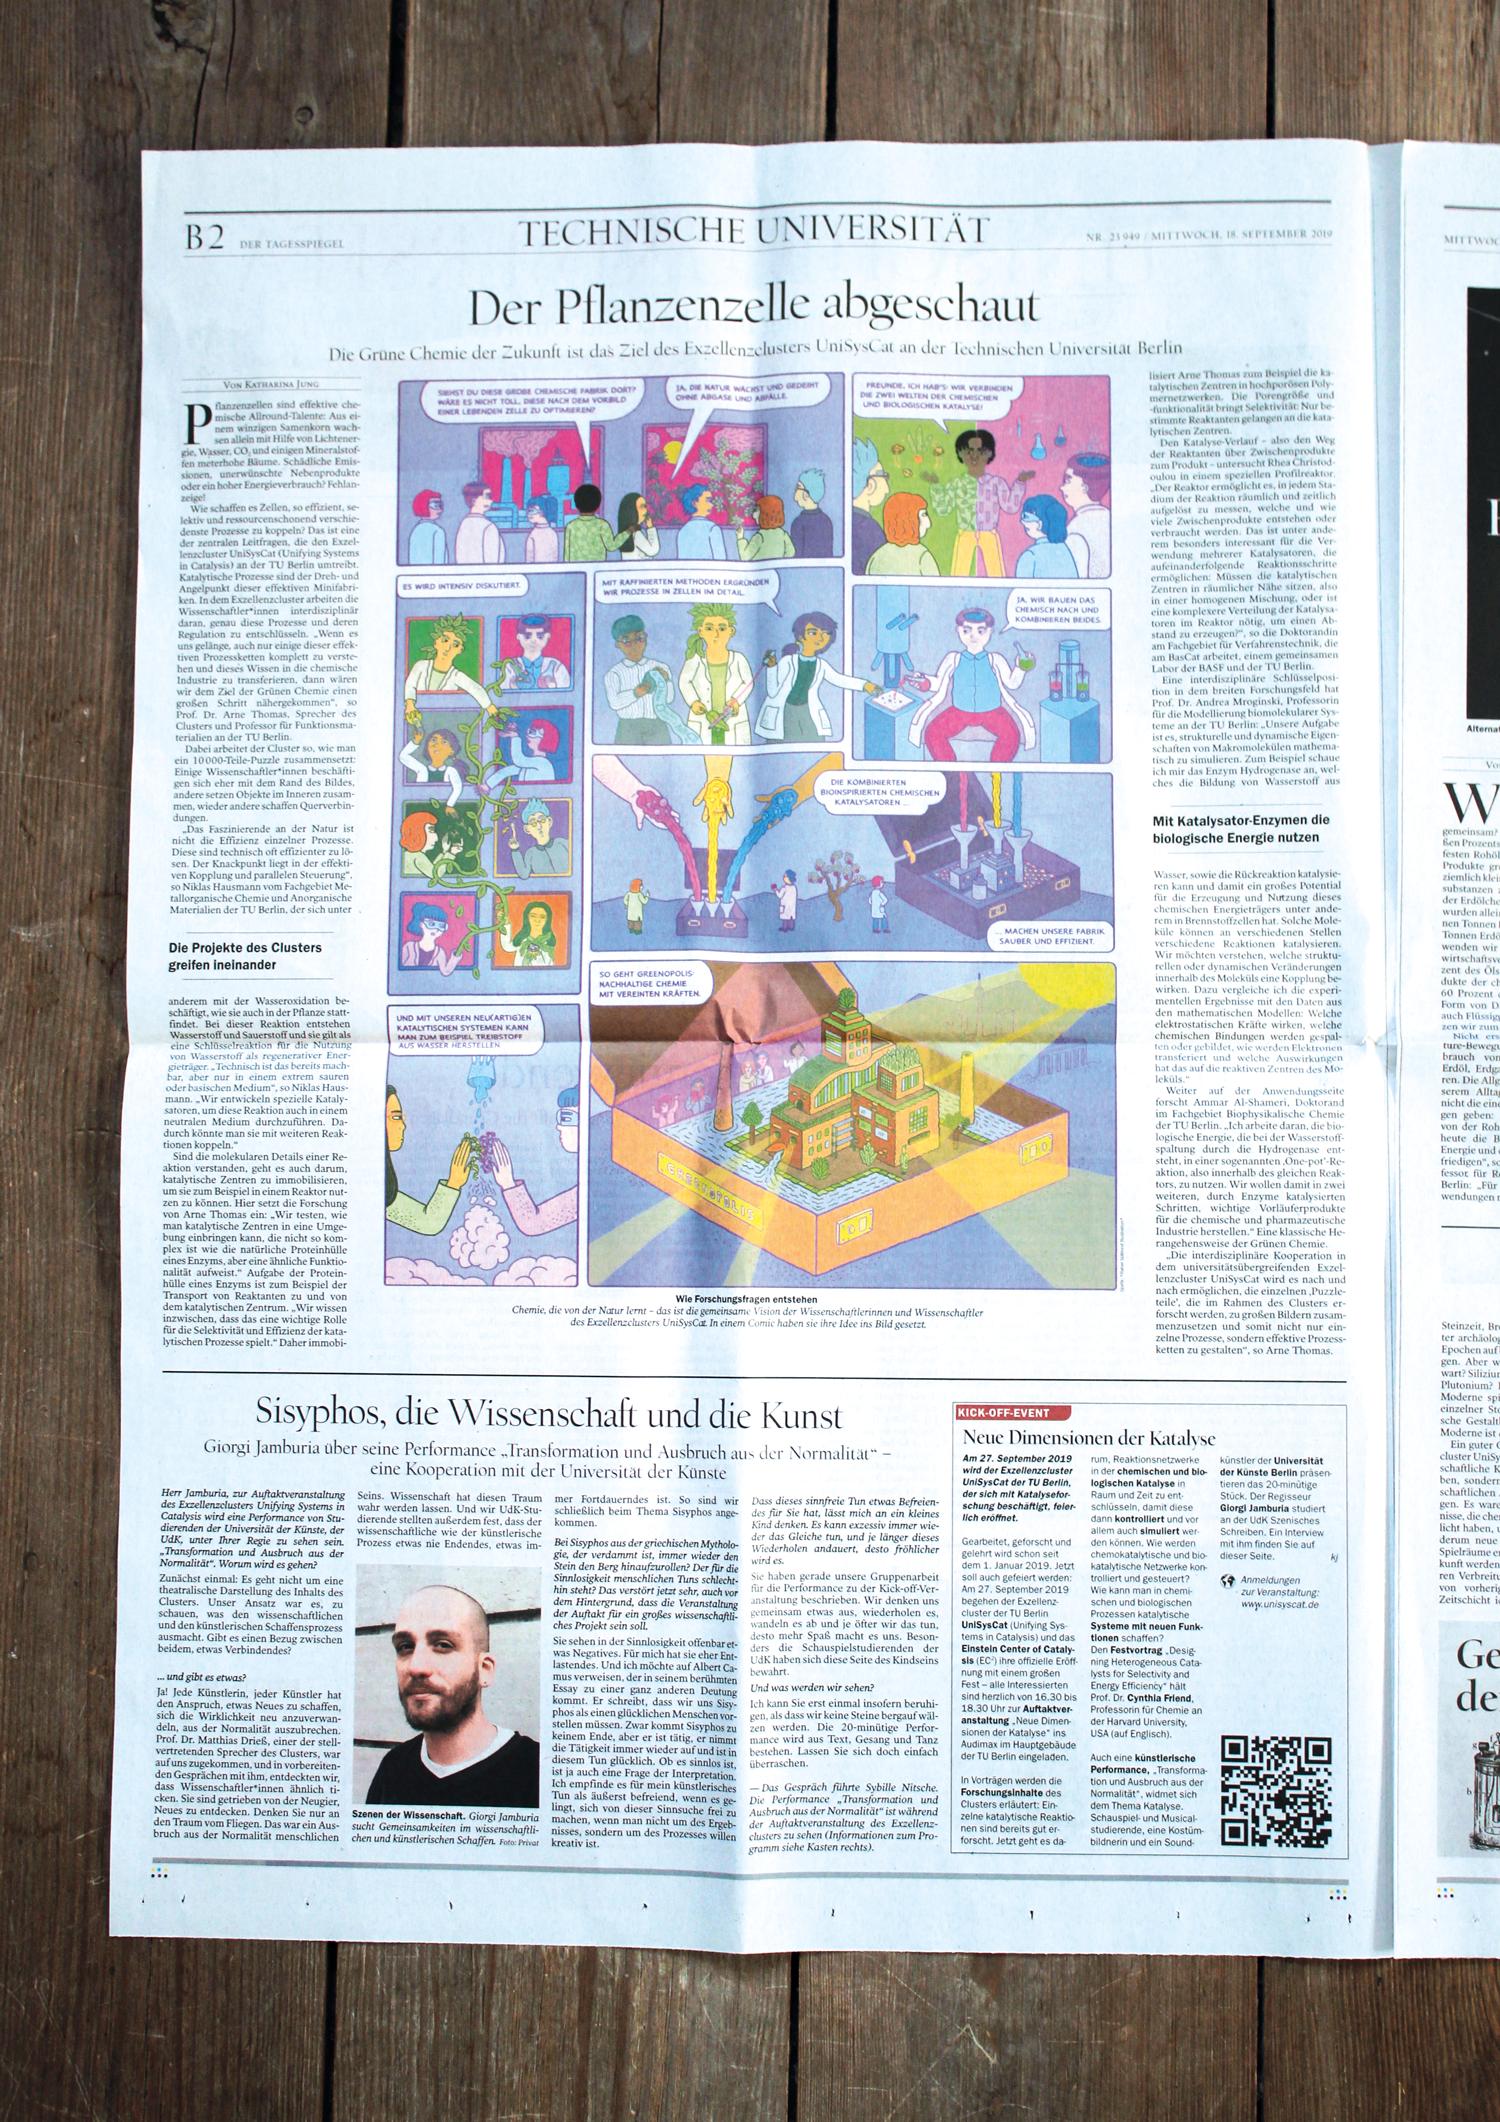 http://rahelsuesskind.de/wp-content/uploads/2020/04/TU_Zeitung.png